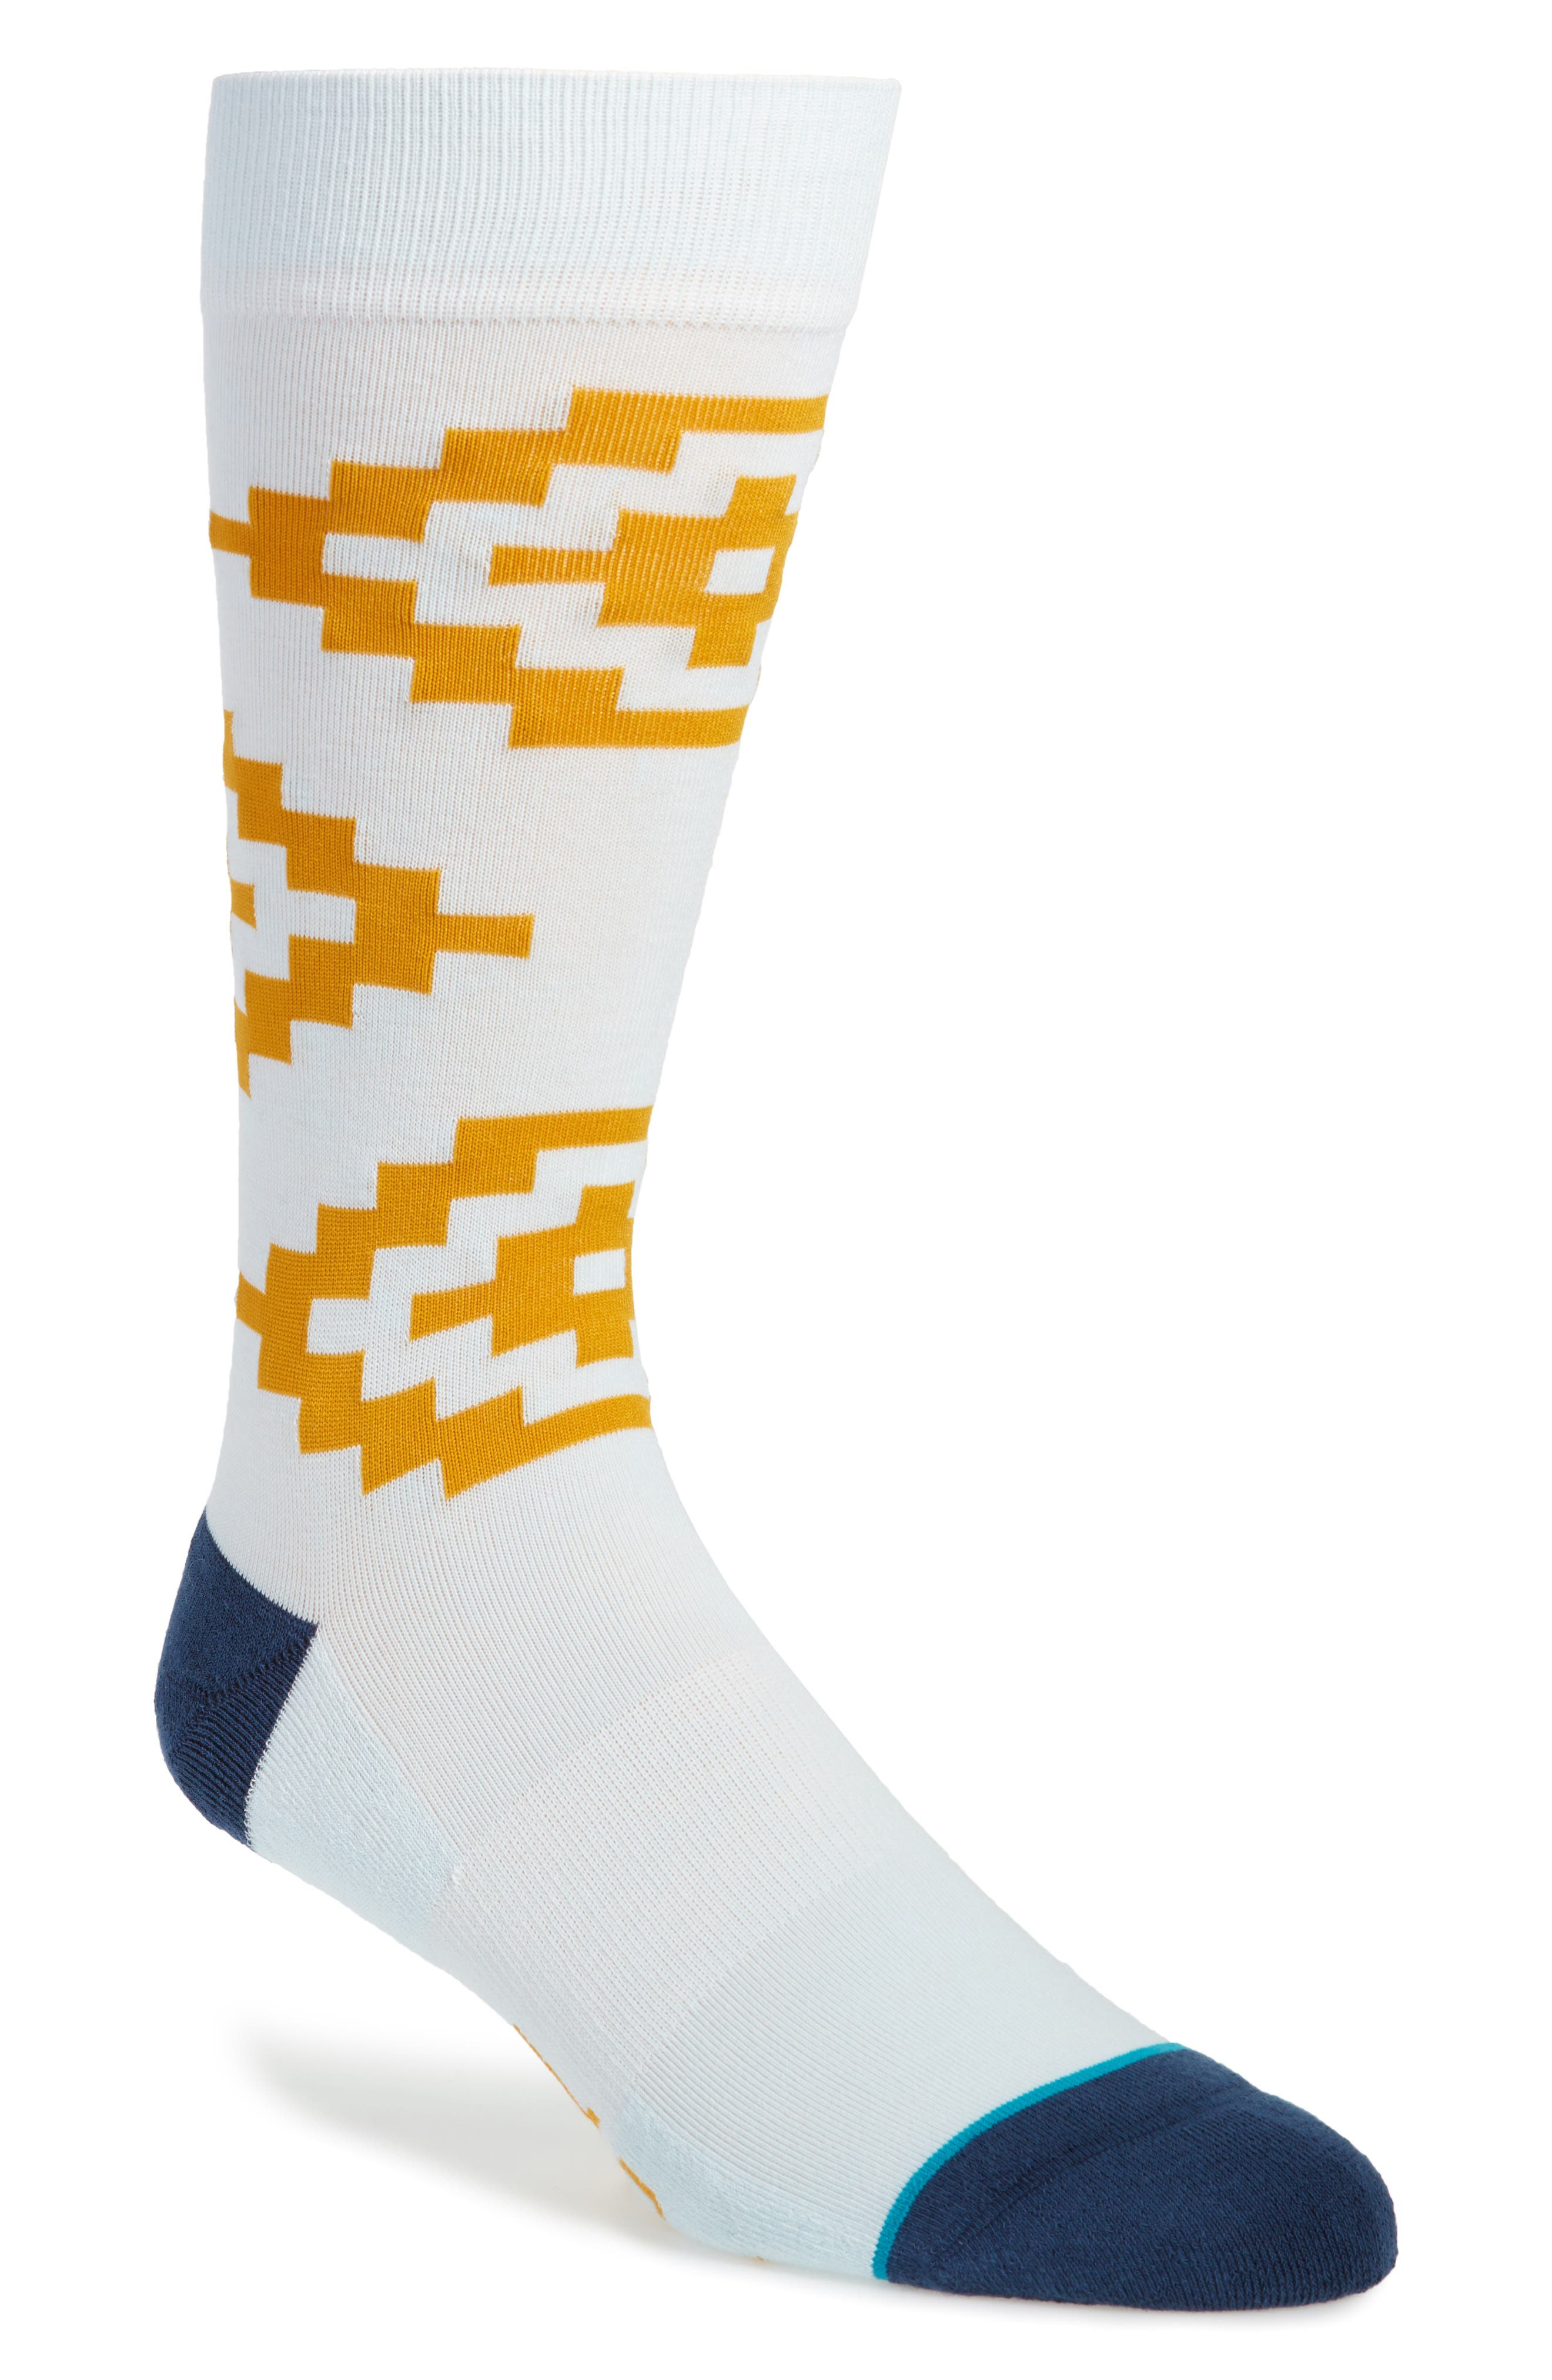 Cairns Crew Socks,                         Main,                         color, Blue